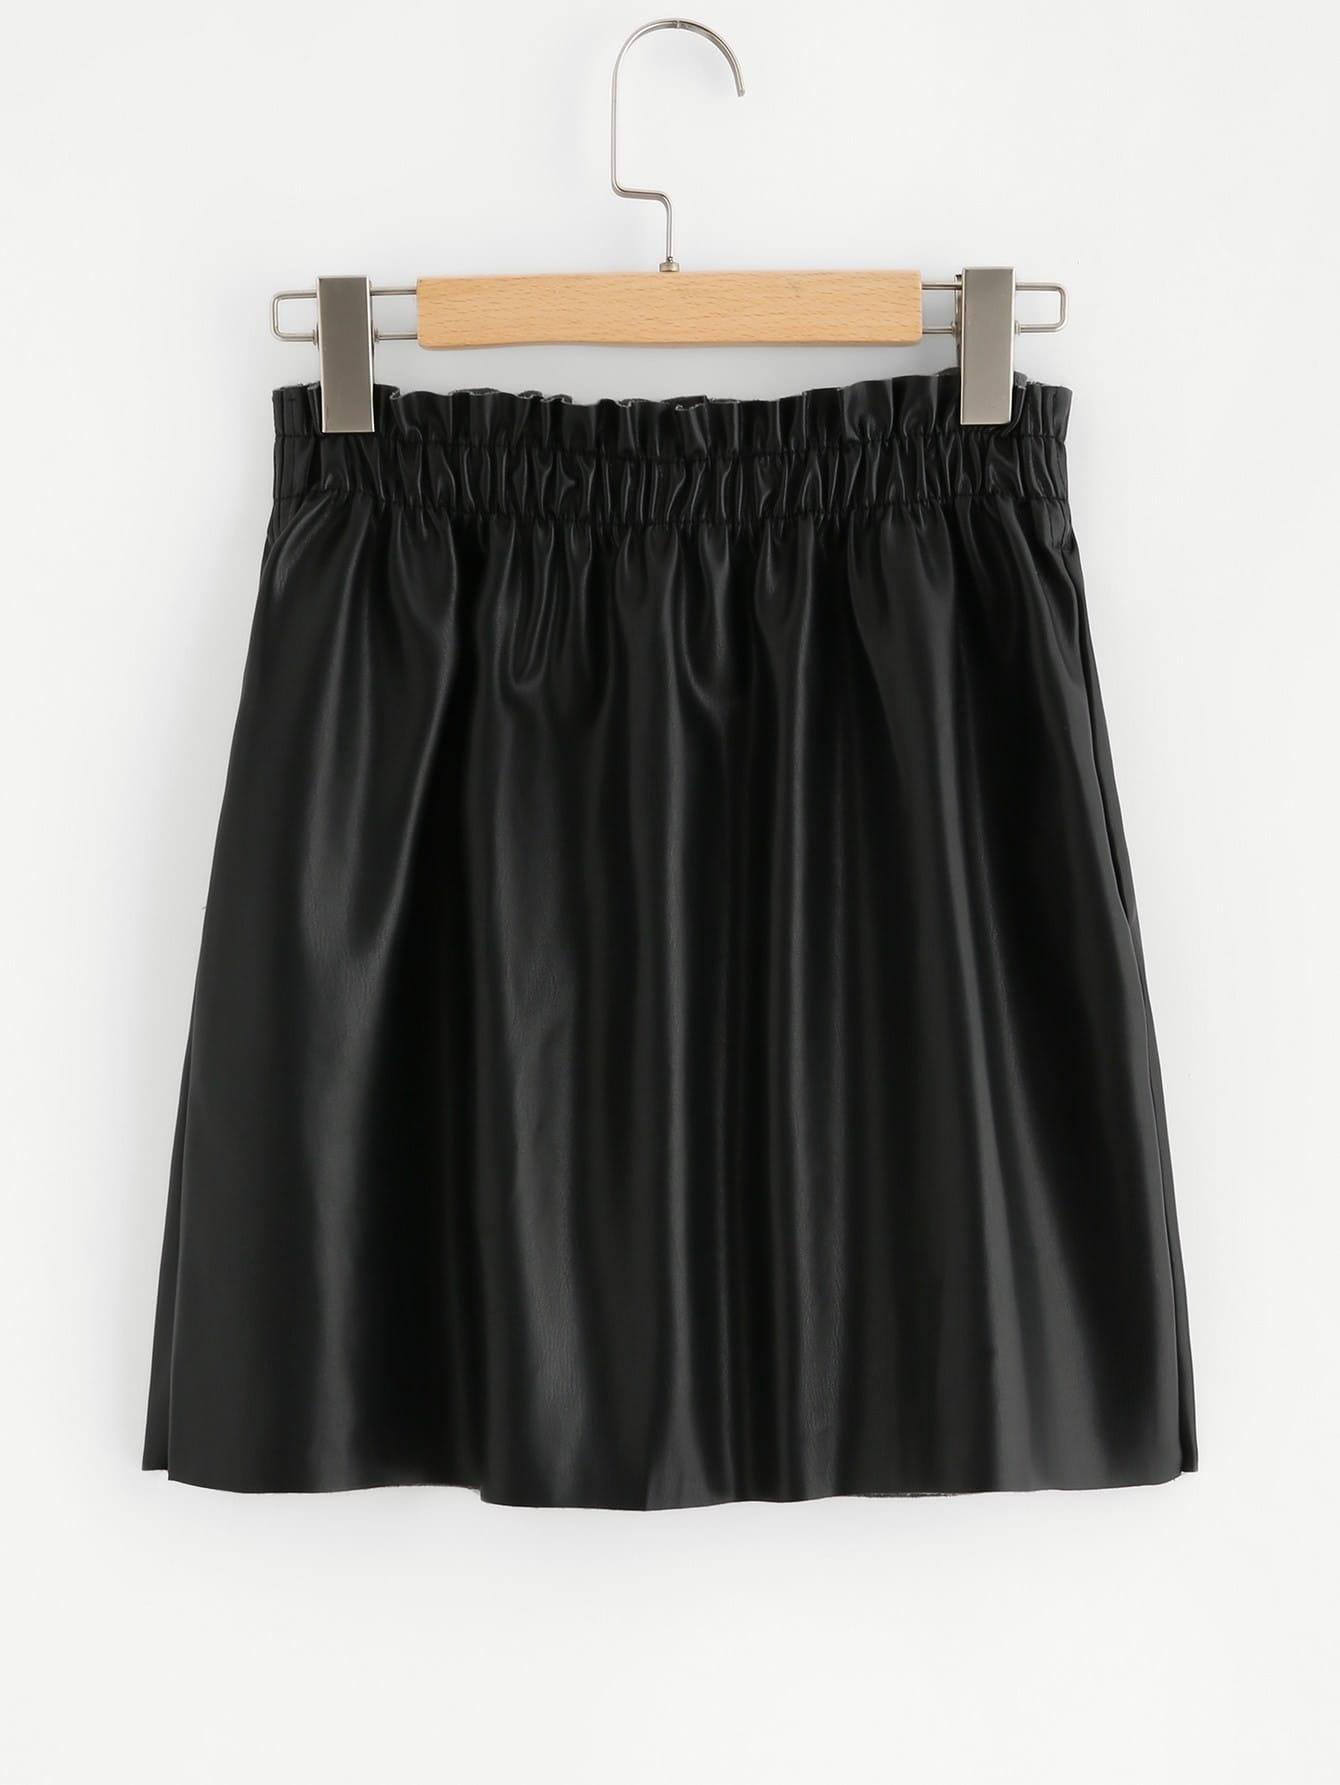 Shirred Waist Button Up Coated Skirt shirred waist zip back fit